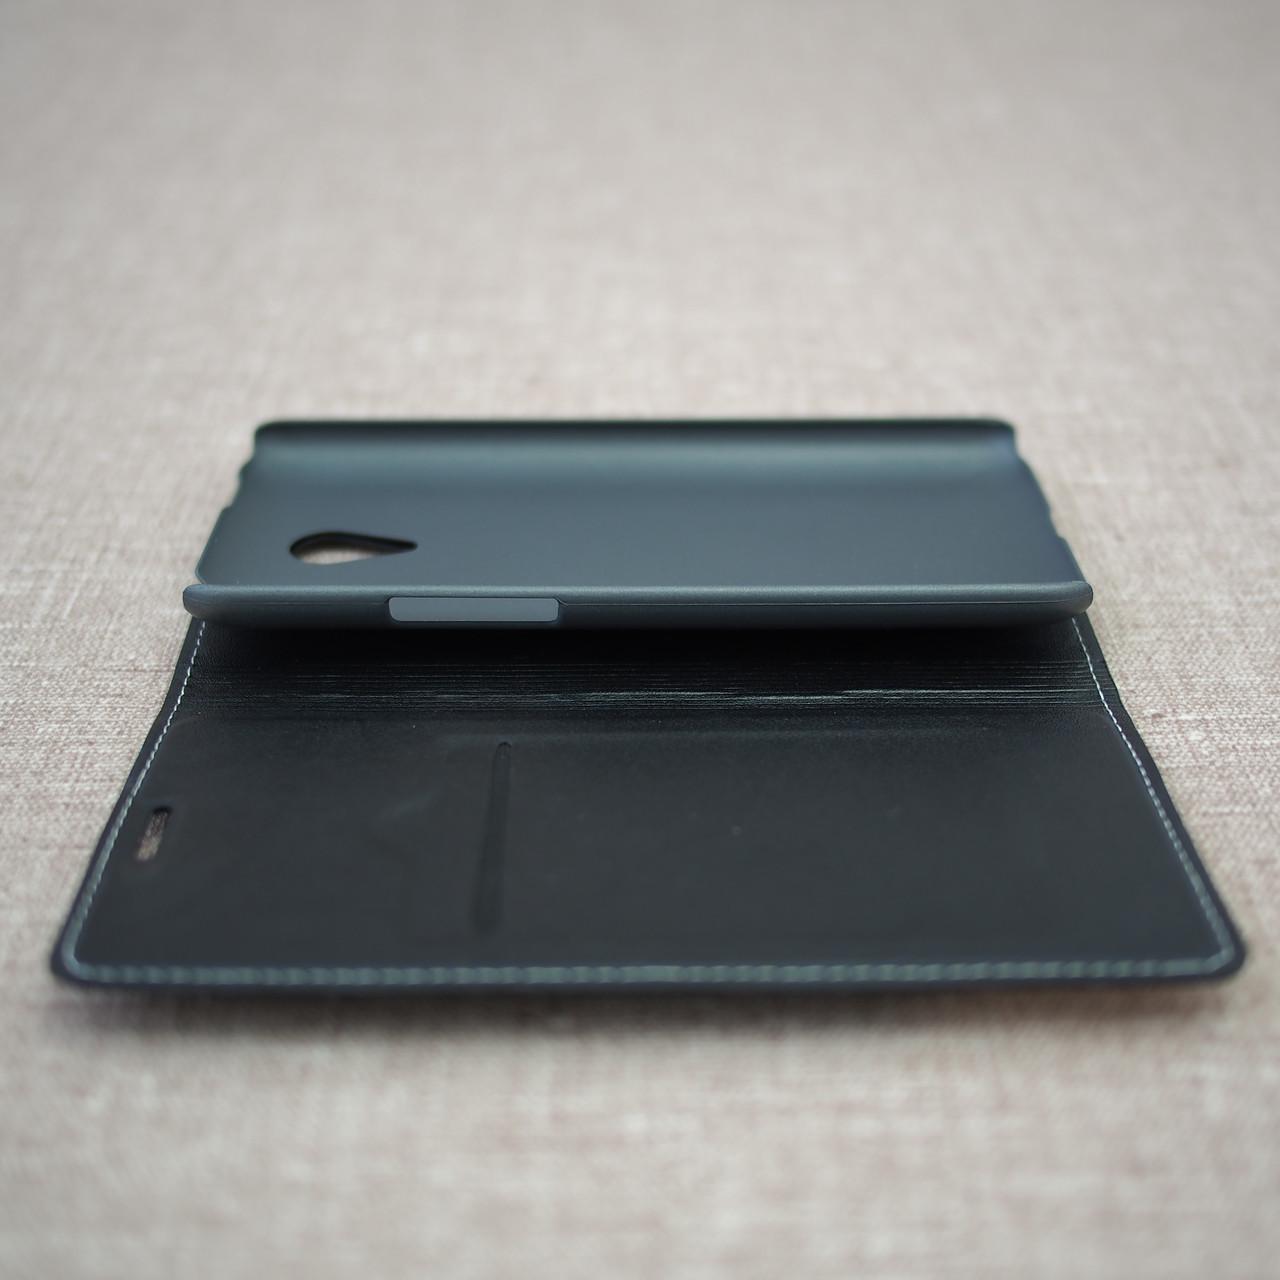 Чехол Book-case Meizu M1 Note black Для телефона Черный